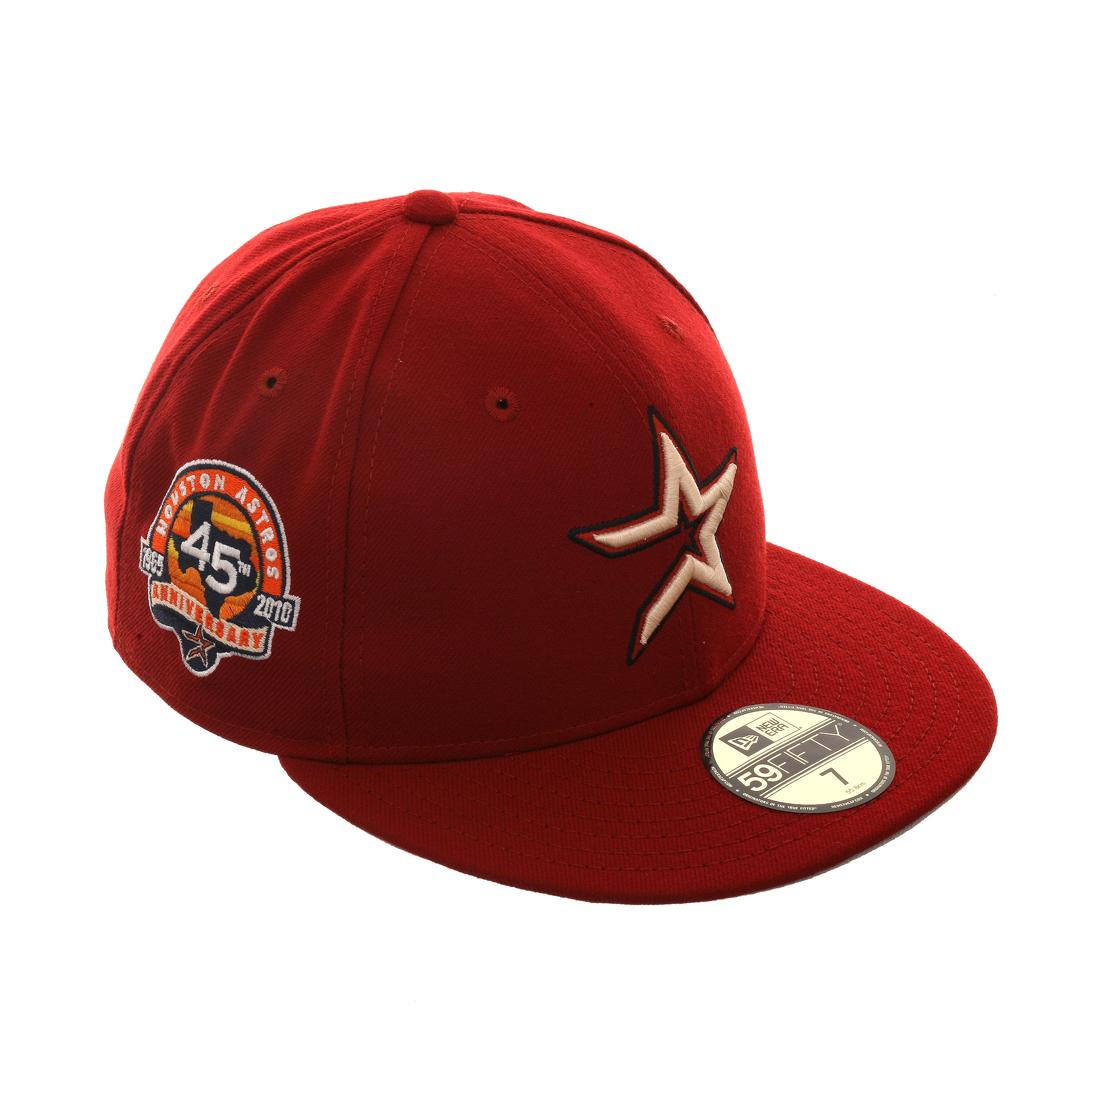 Exclusive New Era 59Fifty Houston Astros 45th Anniversary